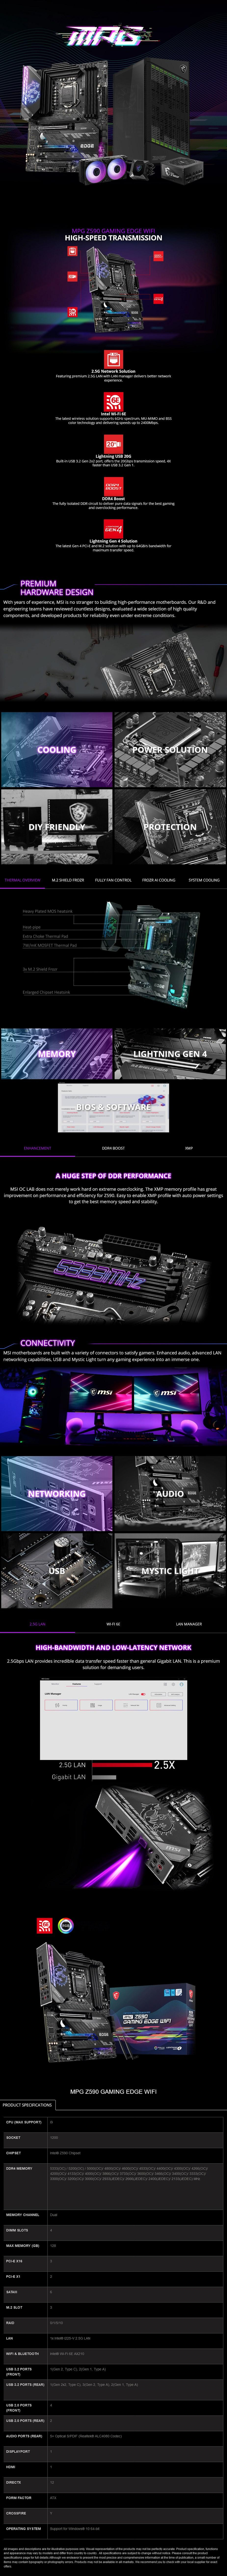 MSI MPG Z590 GAMING EDGE WIFI LGA 1200 ATX Motherboard - Overview 1